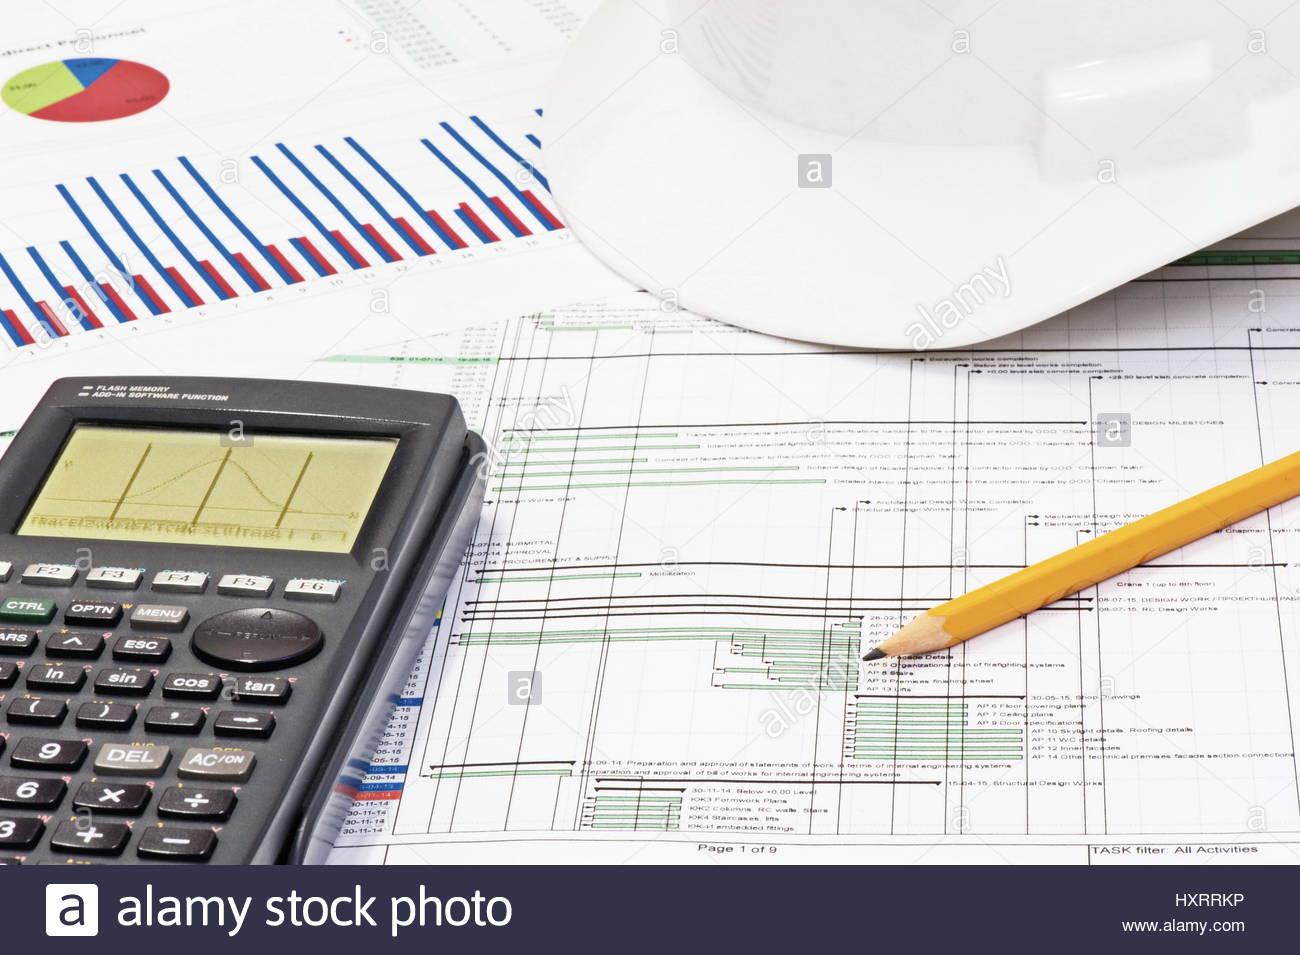 Analyzing construction progress program and calculating statistics analyzing construction progress program and calculating statistics using a scientific calculator ccuart Images